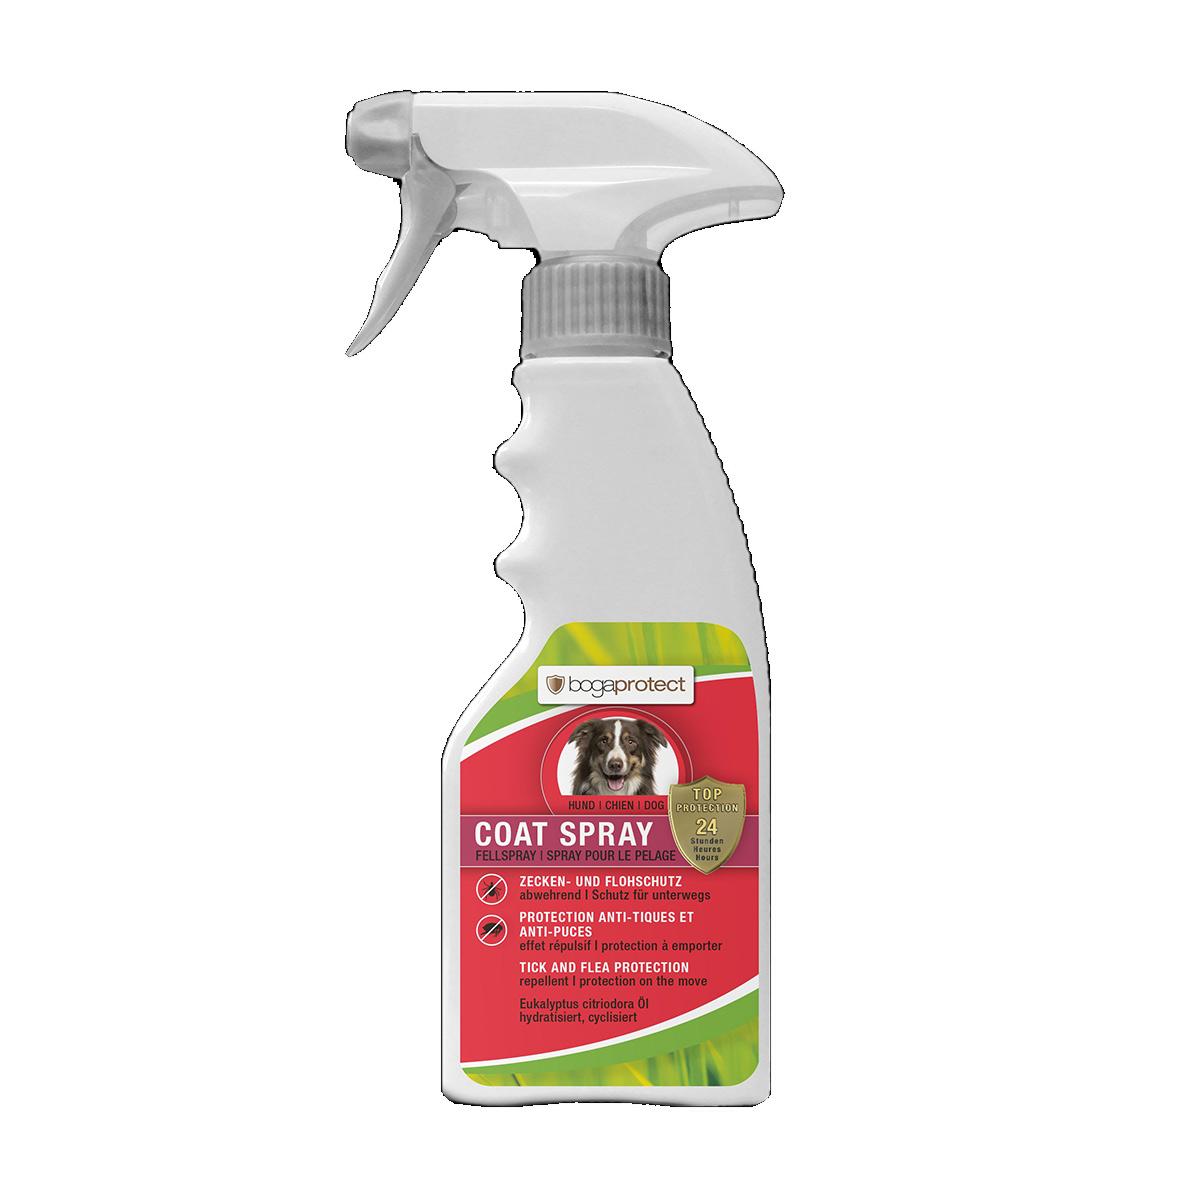 bogaprotect Coat Spray für Hunde 250ml